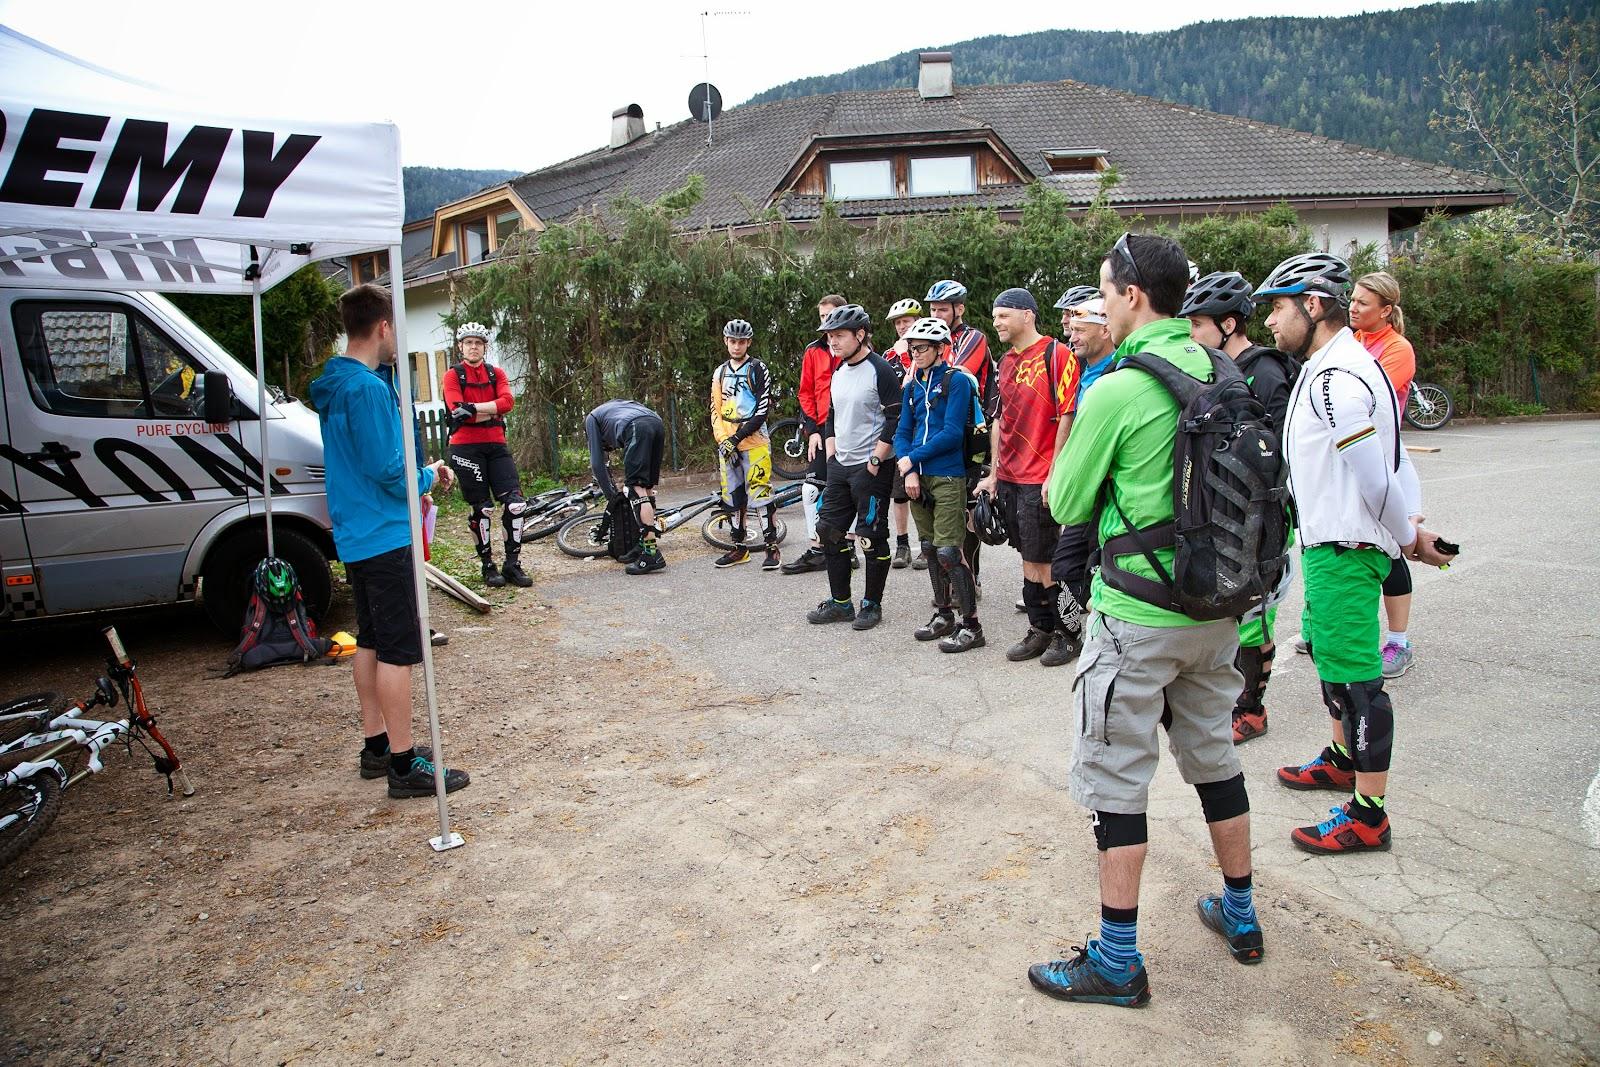 http://www.steineggerhof.com/de/hotelinformationen/fotogalerie/freetrail-camp-mtb-academy-12-04-14-id-6001491388131901649.html